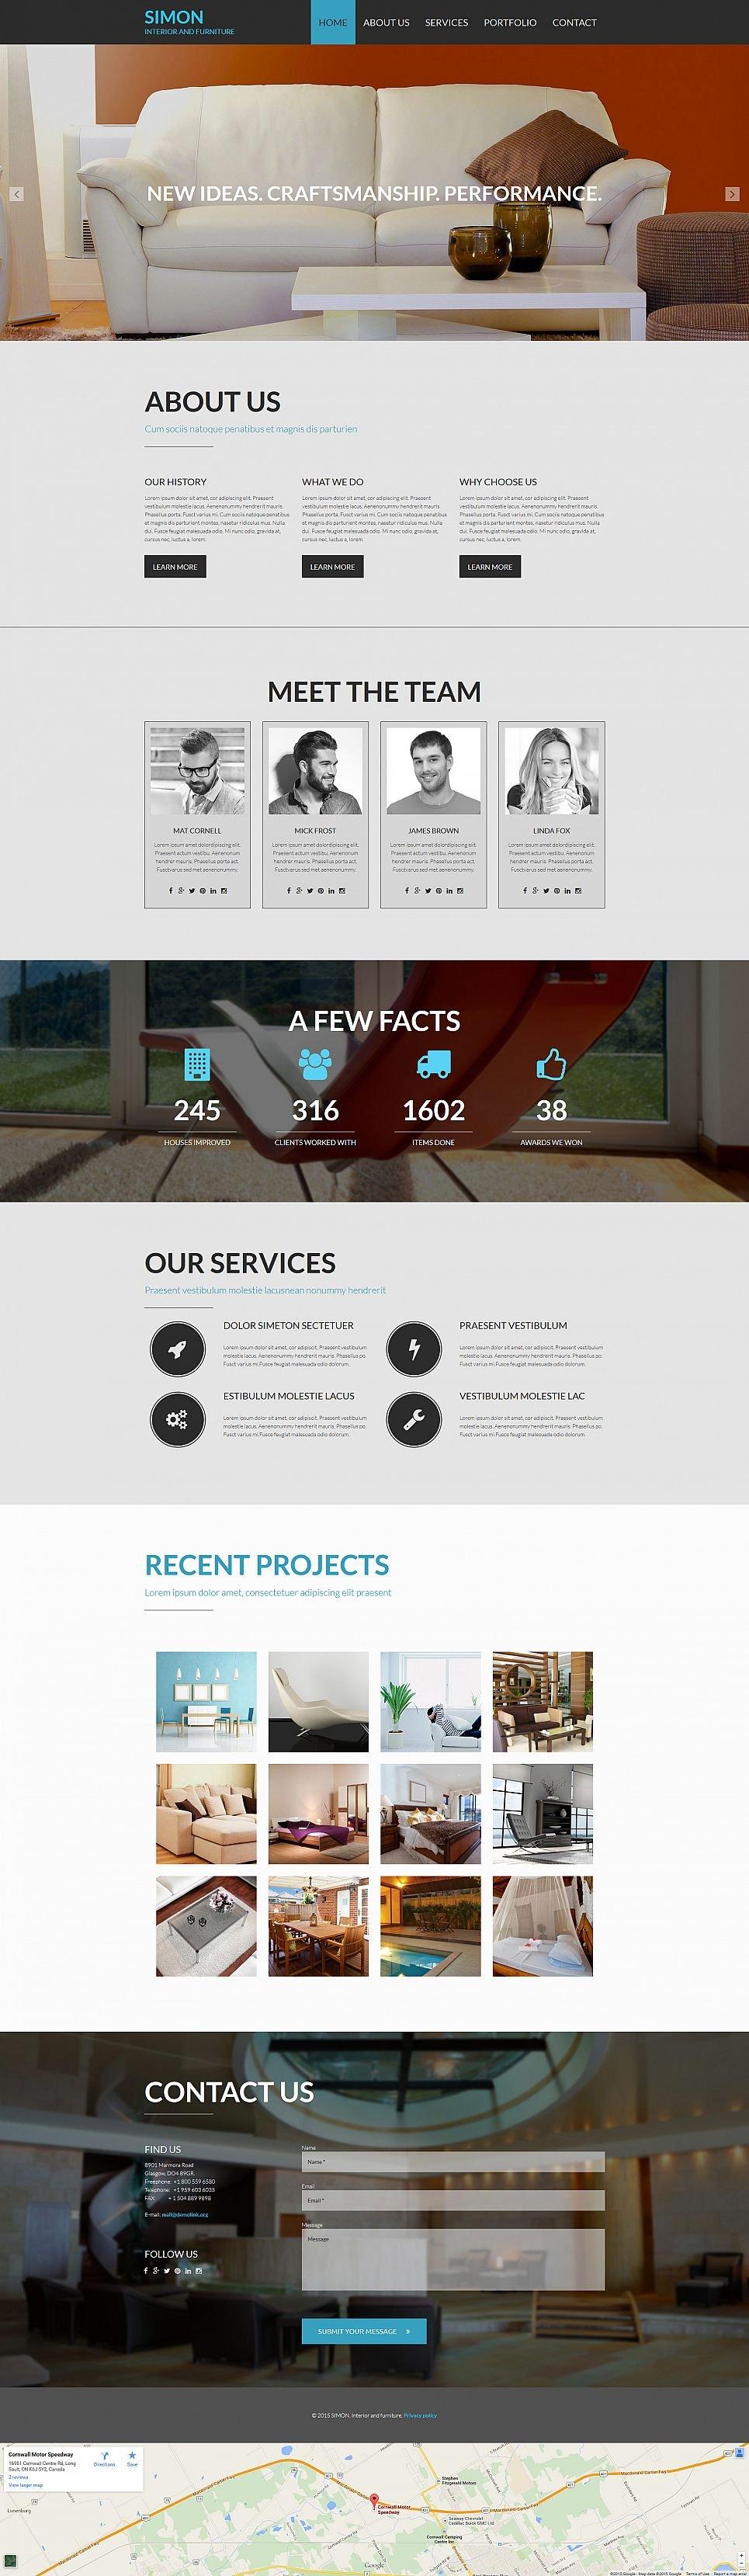 Home Interior Website Design - image